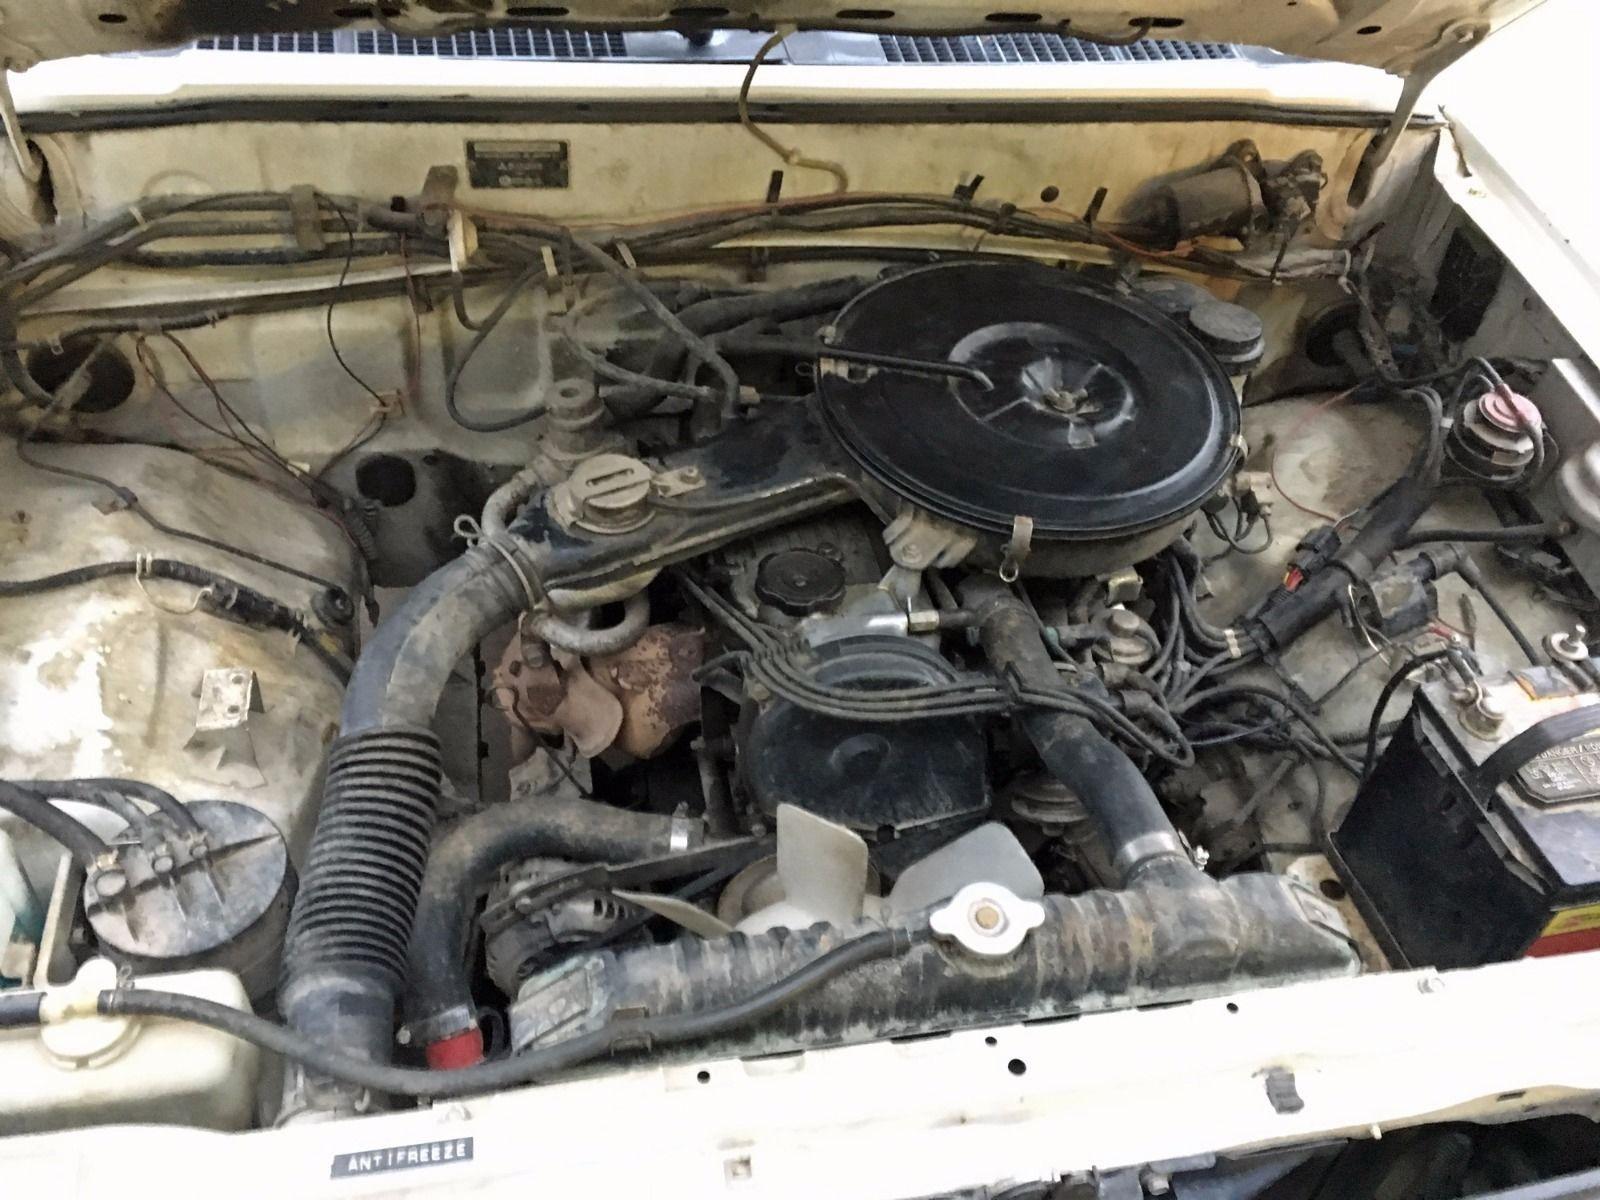 Seanallop 1983 Dodge D50 4x4 Turbo Diesel For Sale